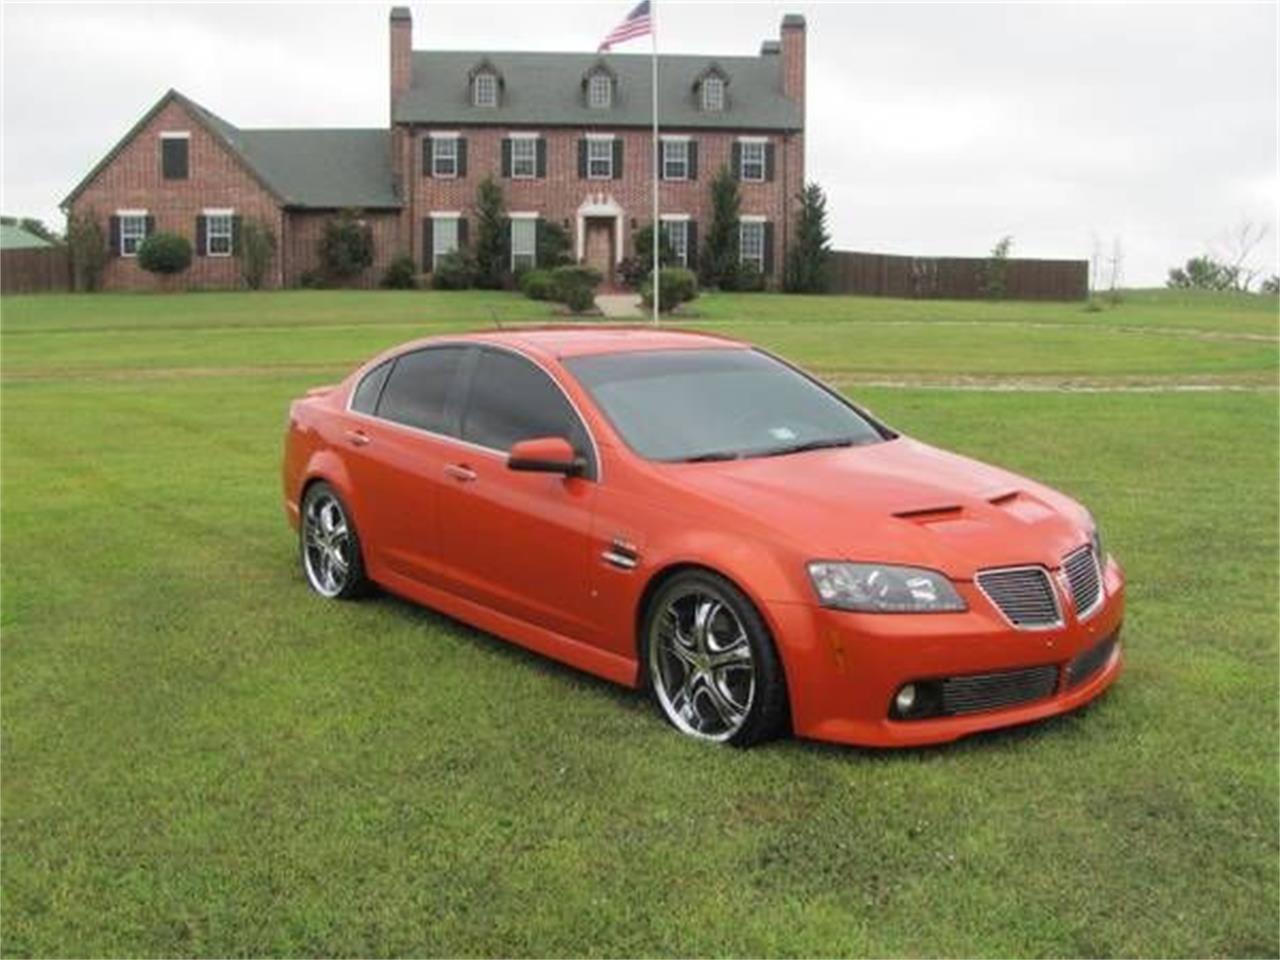 2008 pontiac g8 for sale | classiccars | cc-1162715